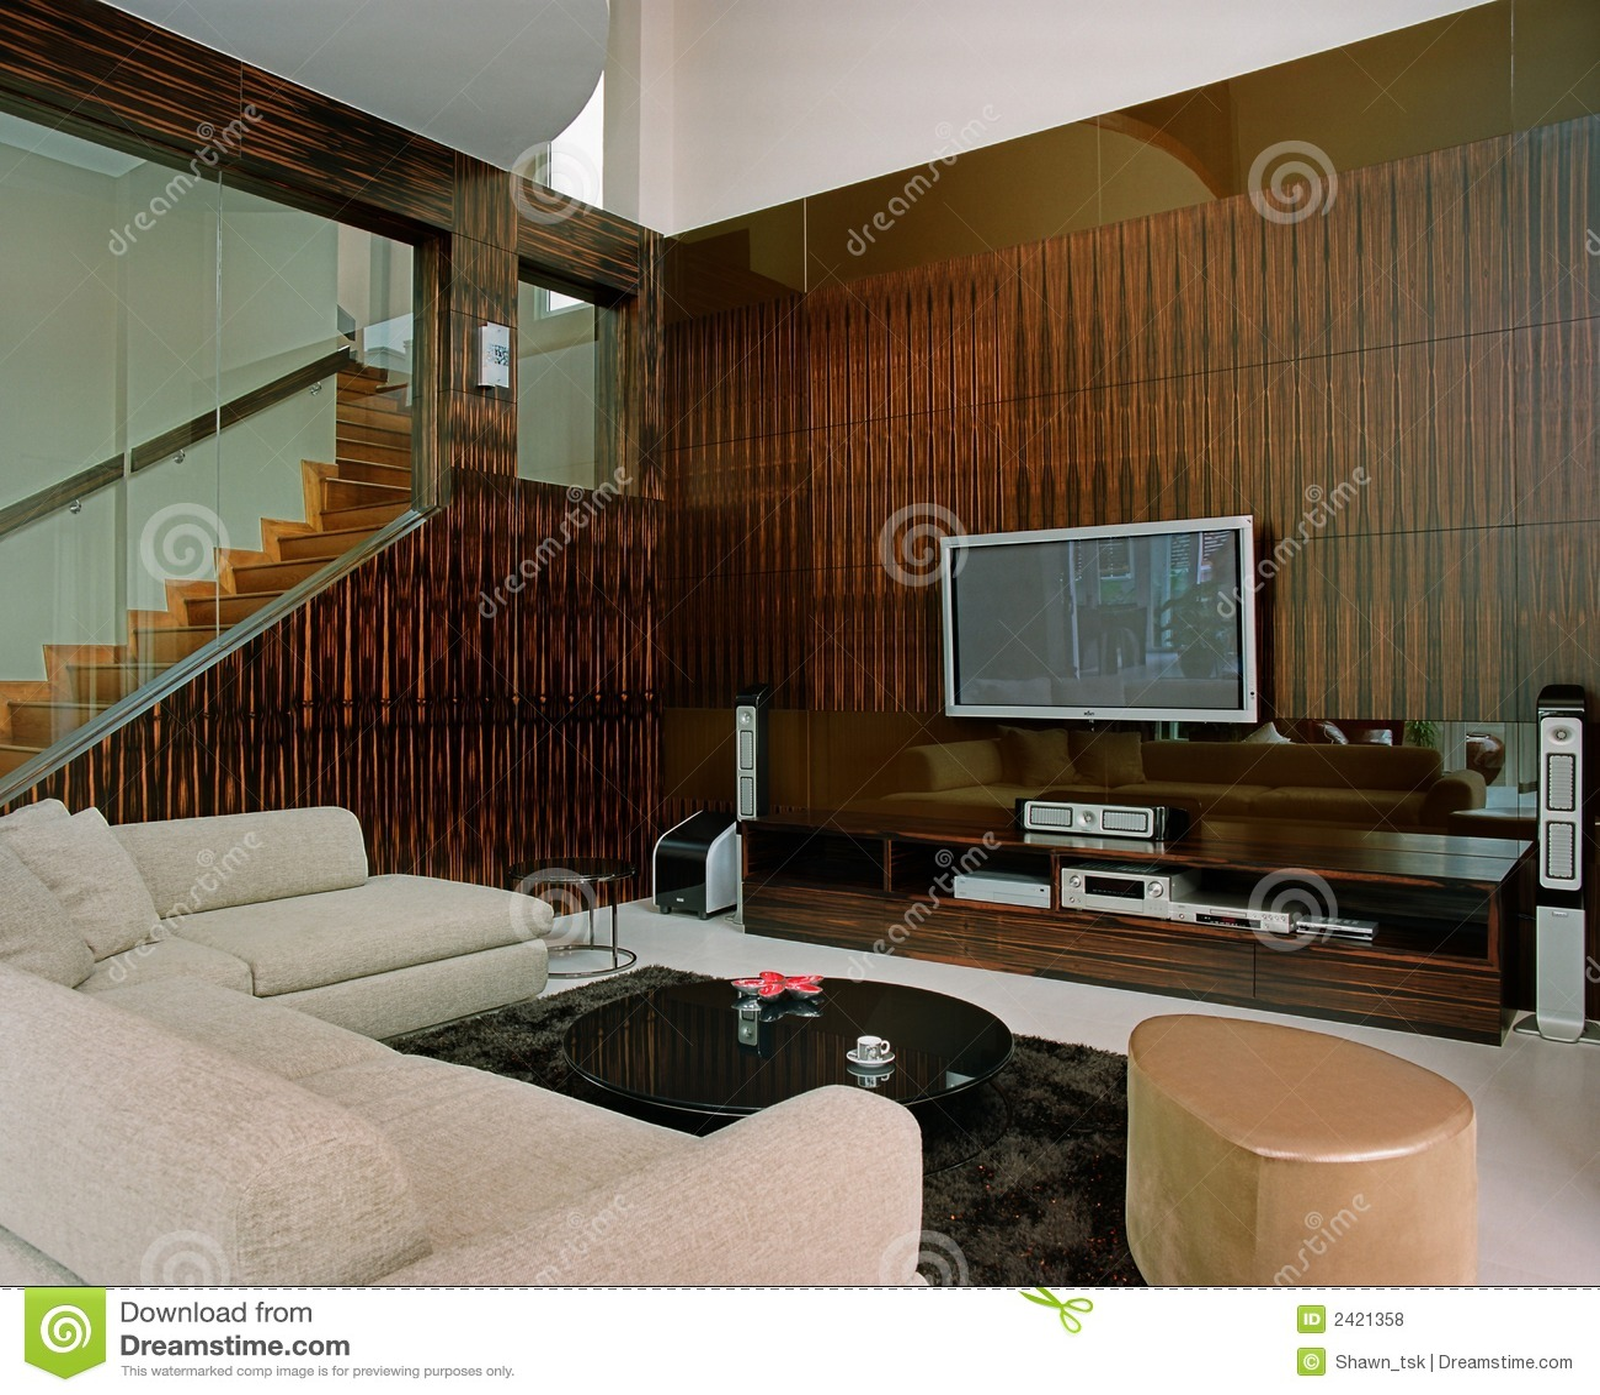 Interior Design Living Royalty Free Stock Photos Image 2421358